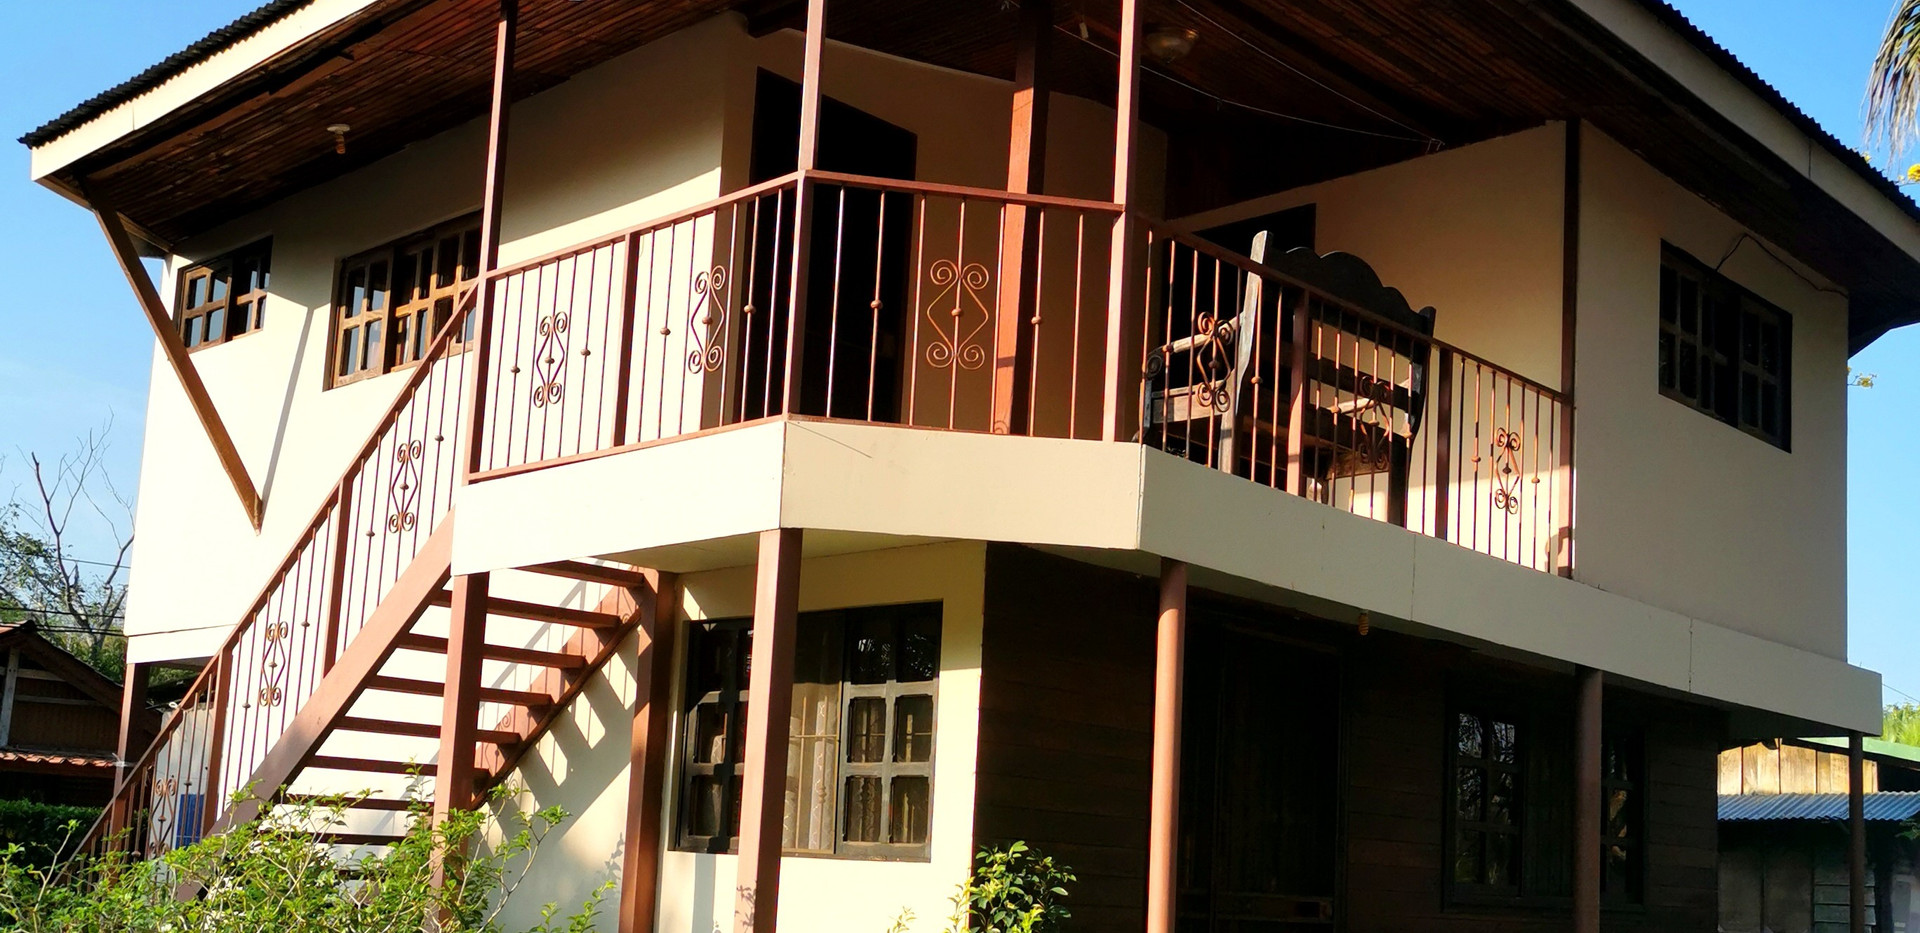 Linda Vista cottage vista frente Abril 2